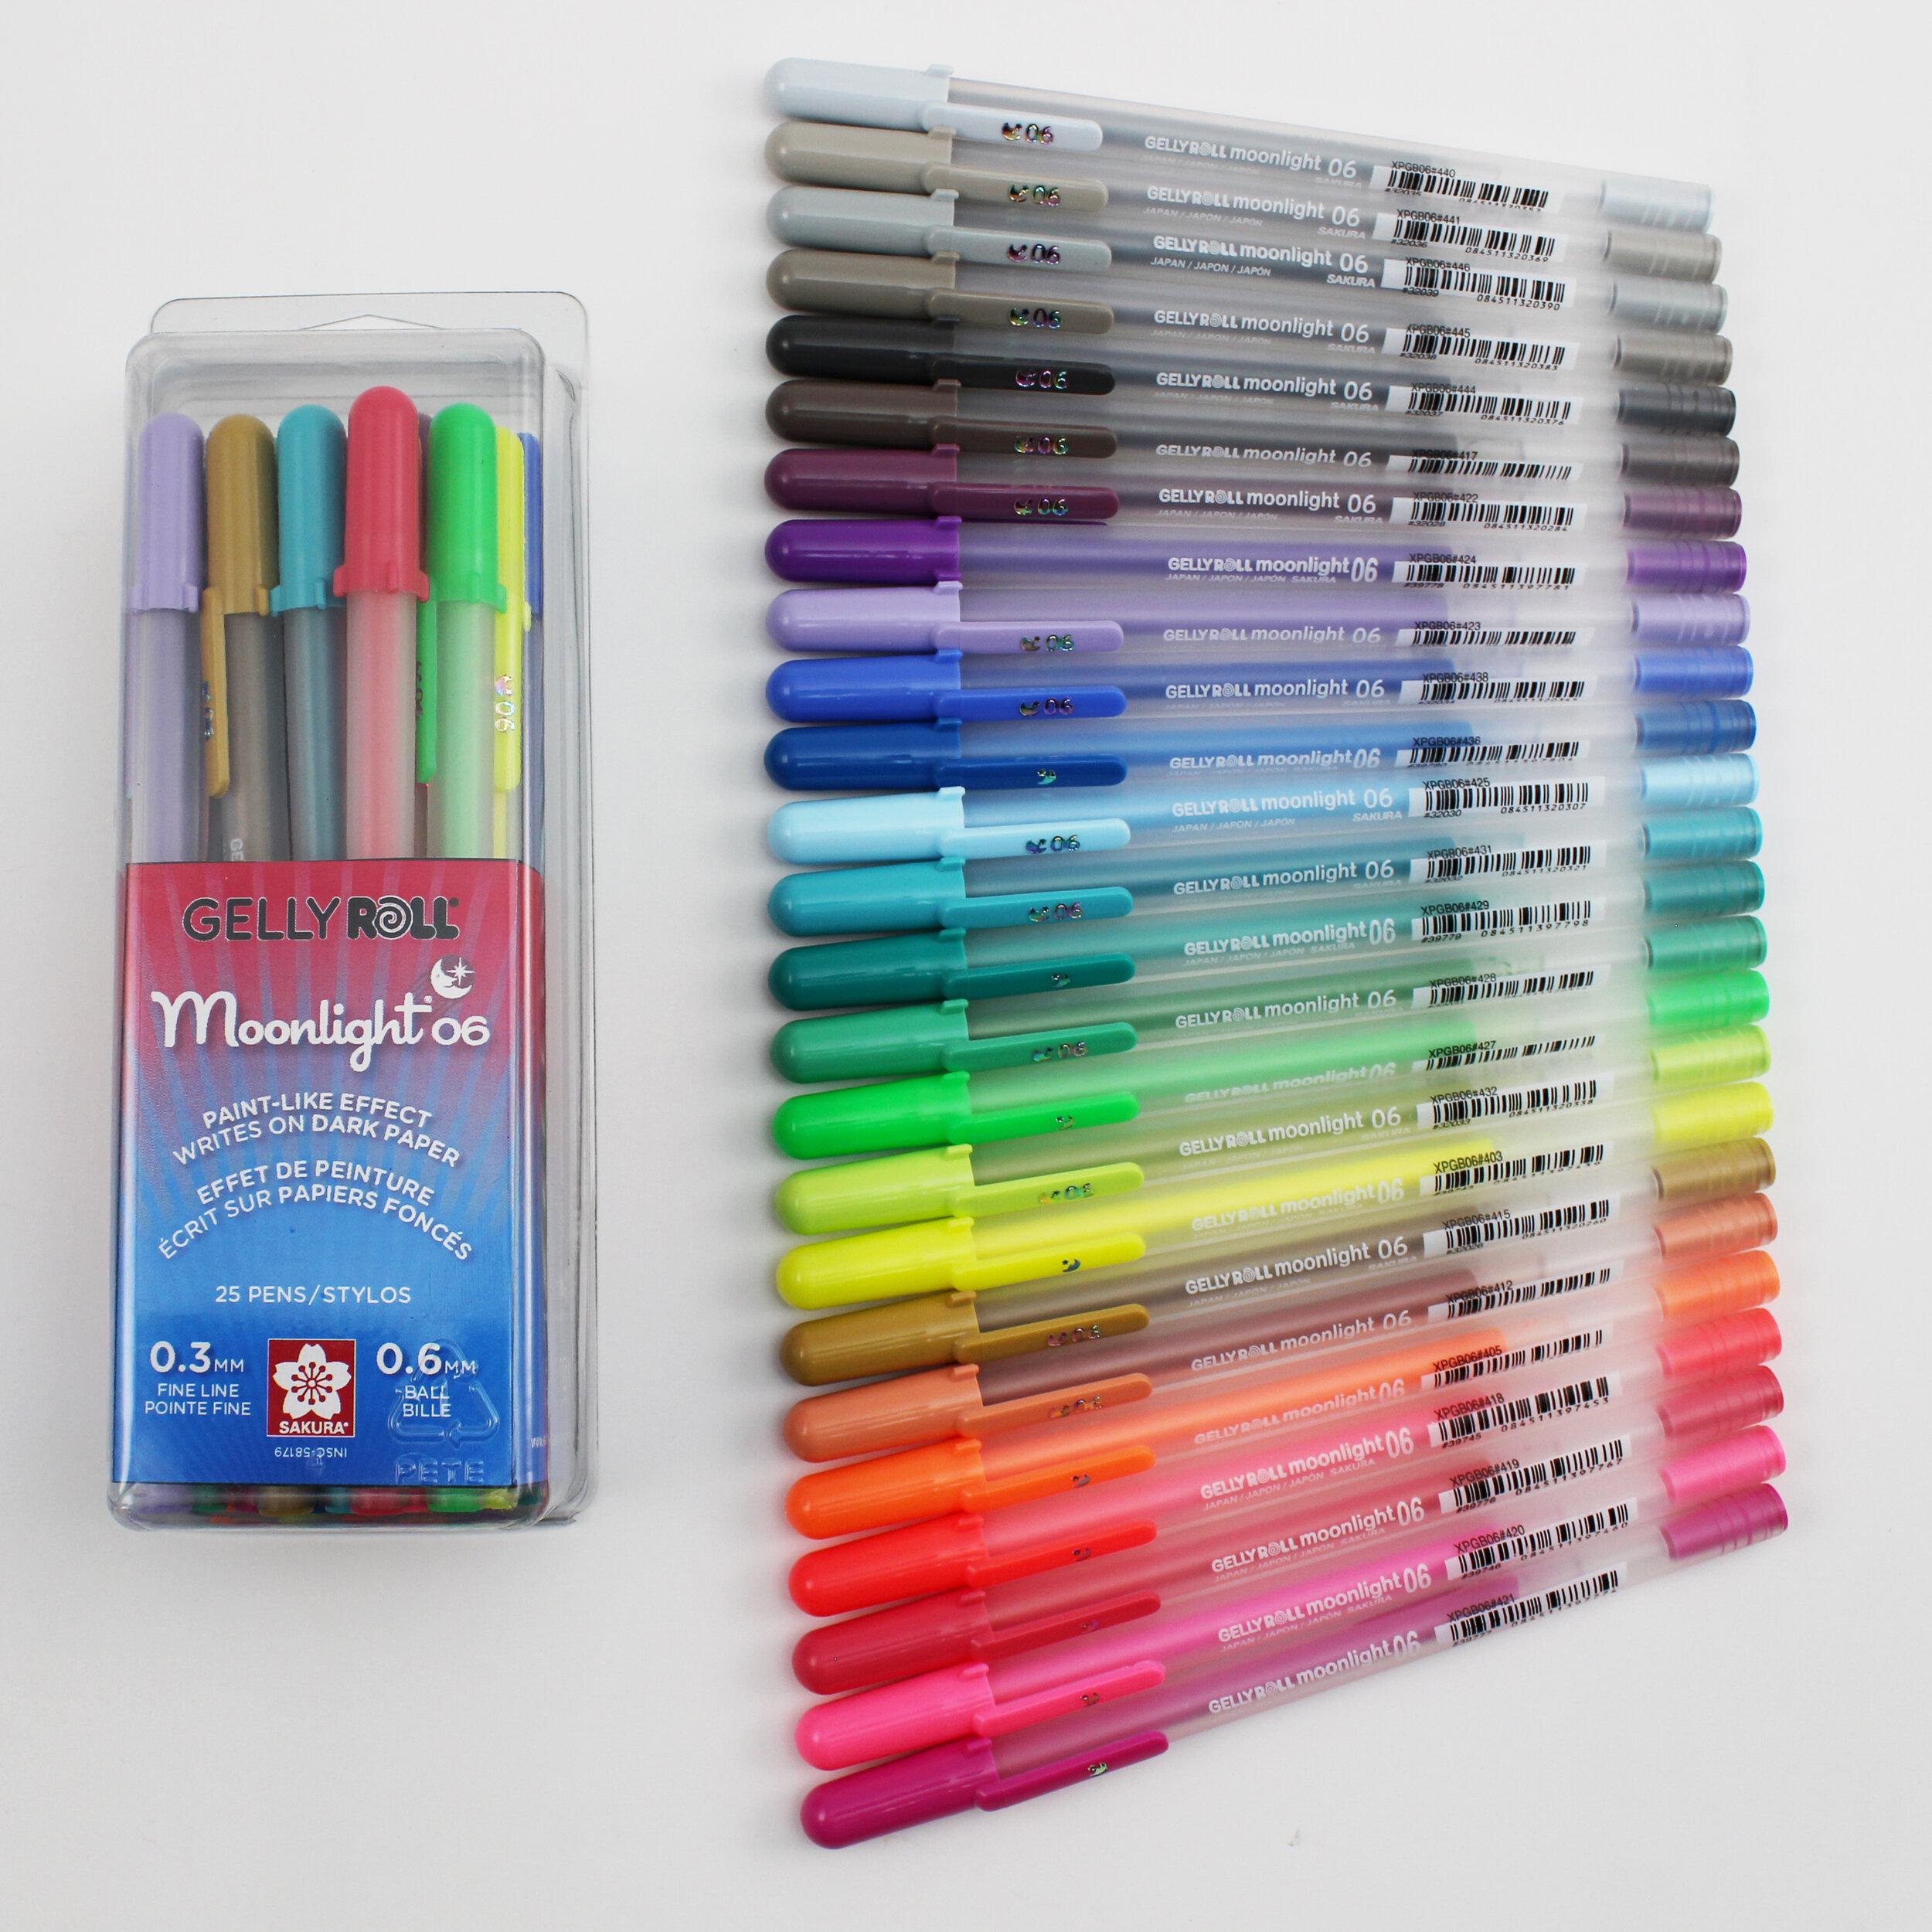 SAKURA Gelly Roll 12 Mix Pack of Rollerball Pens Moonlight 06 Fine Universe